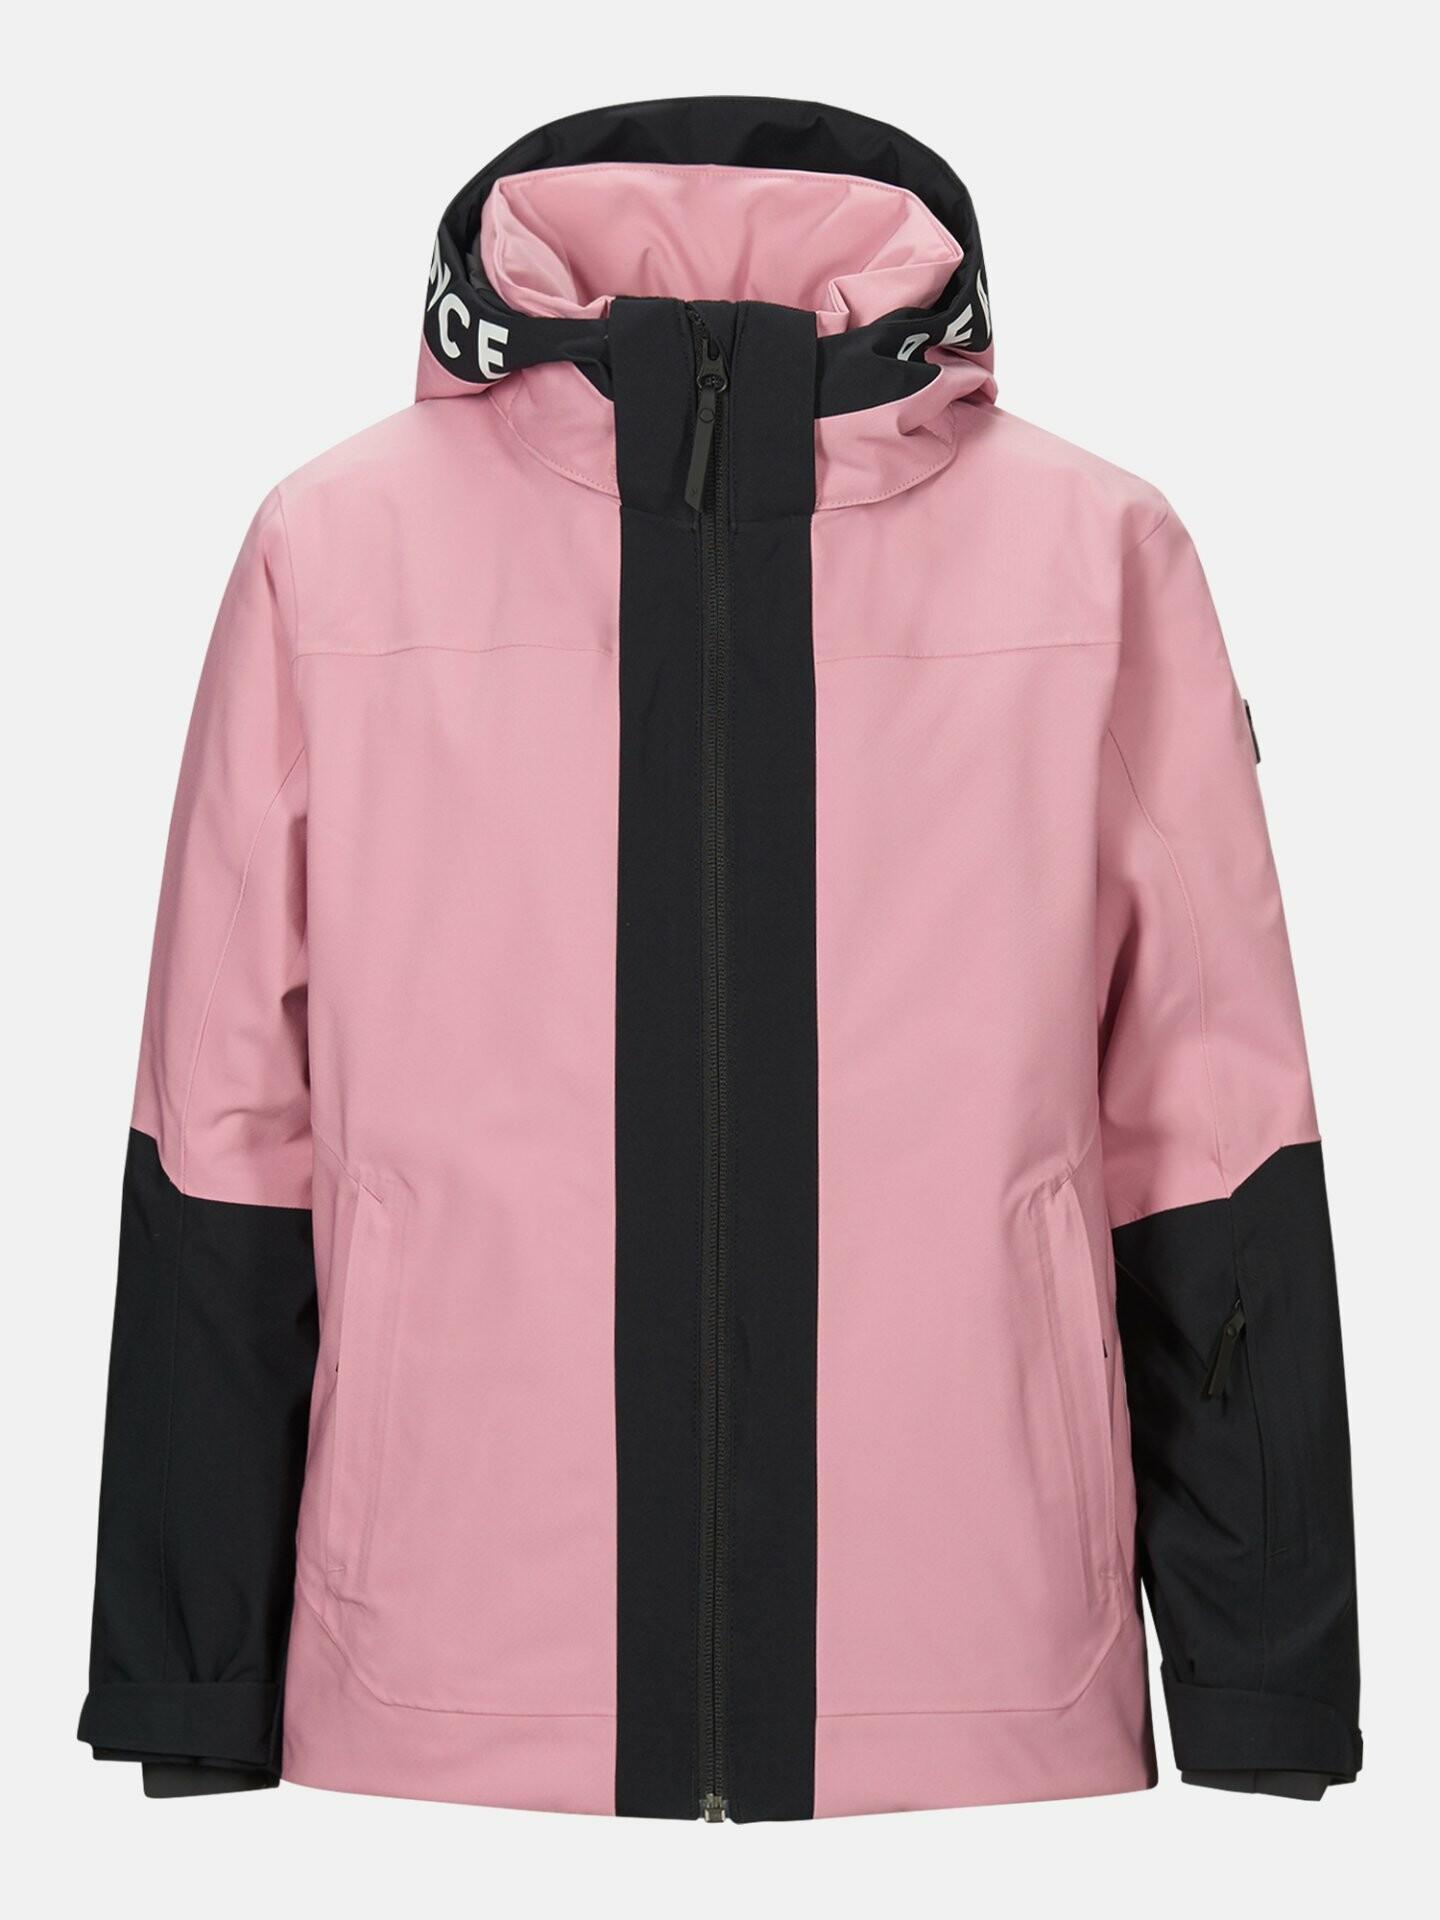 Peak Performance Girls Rider Ski Jacket 2021